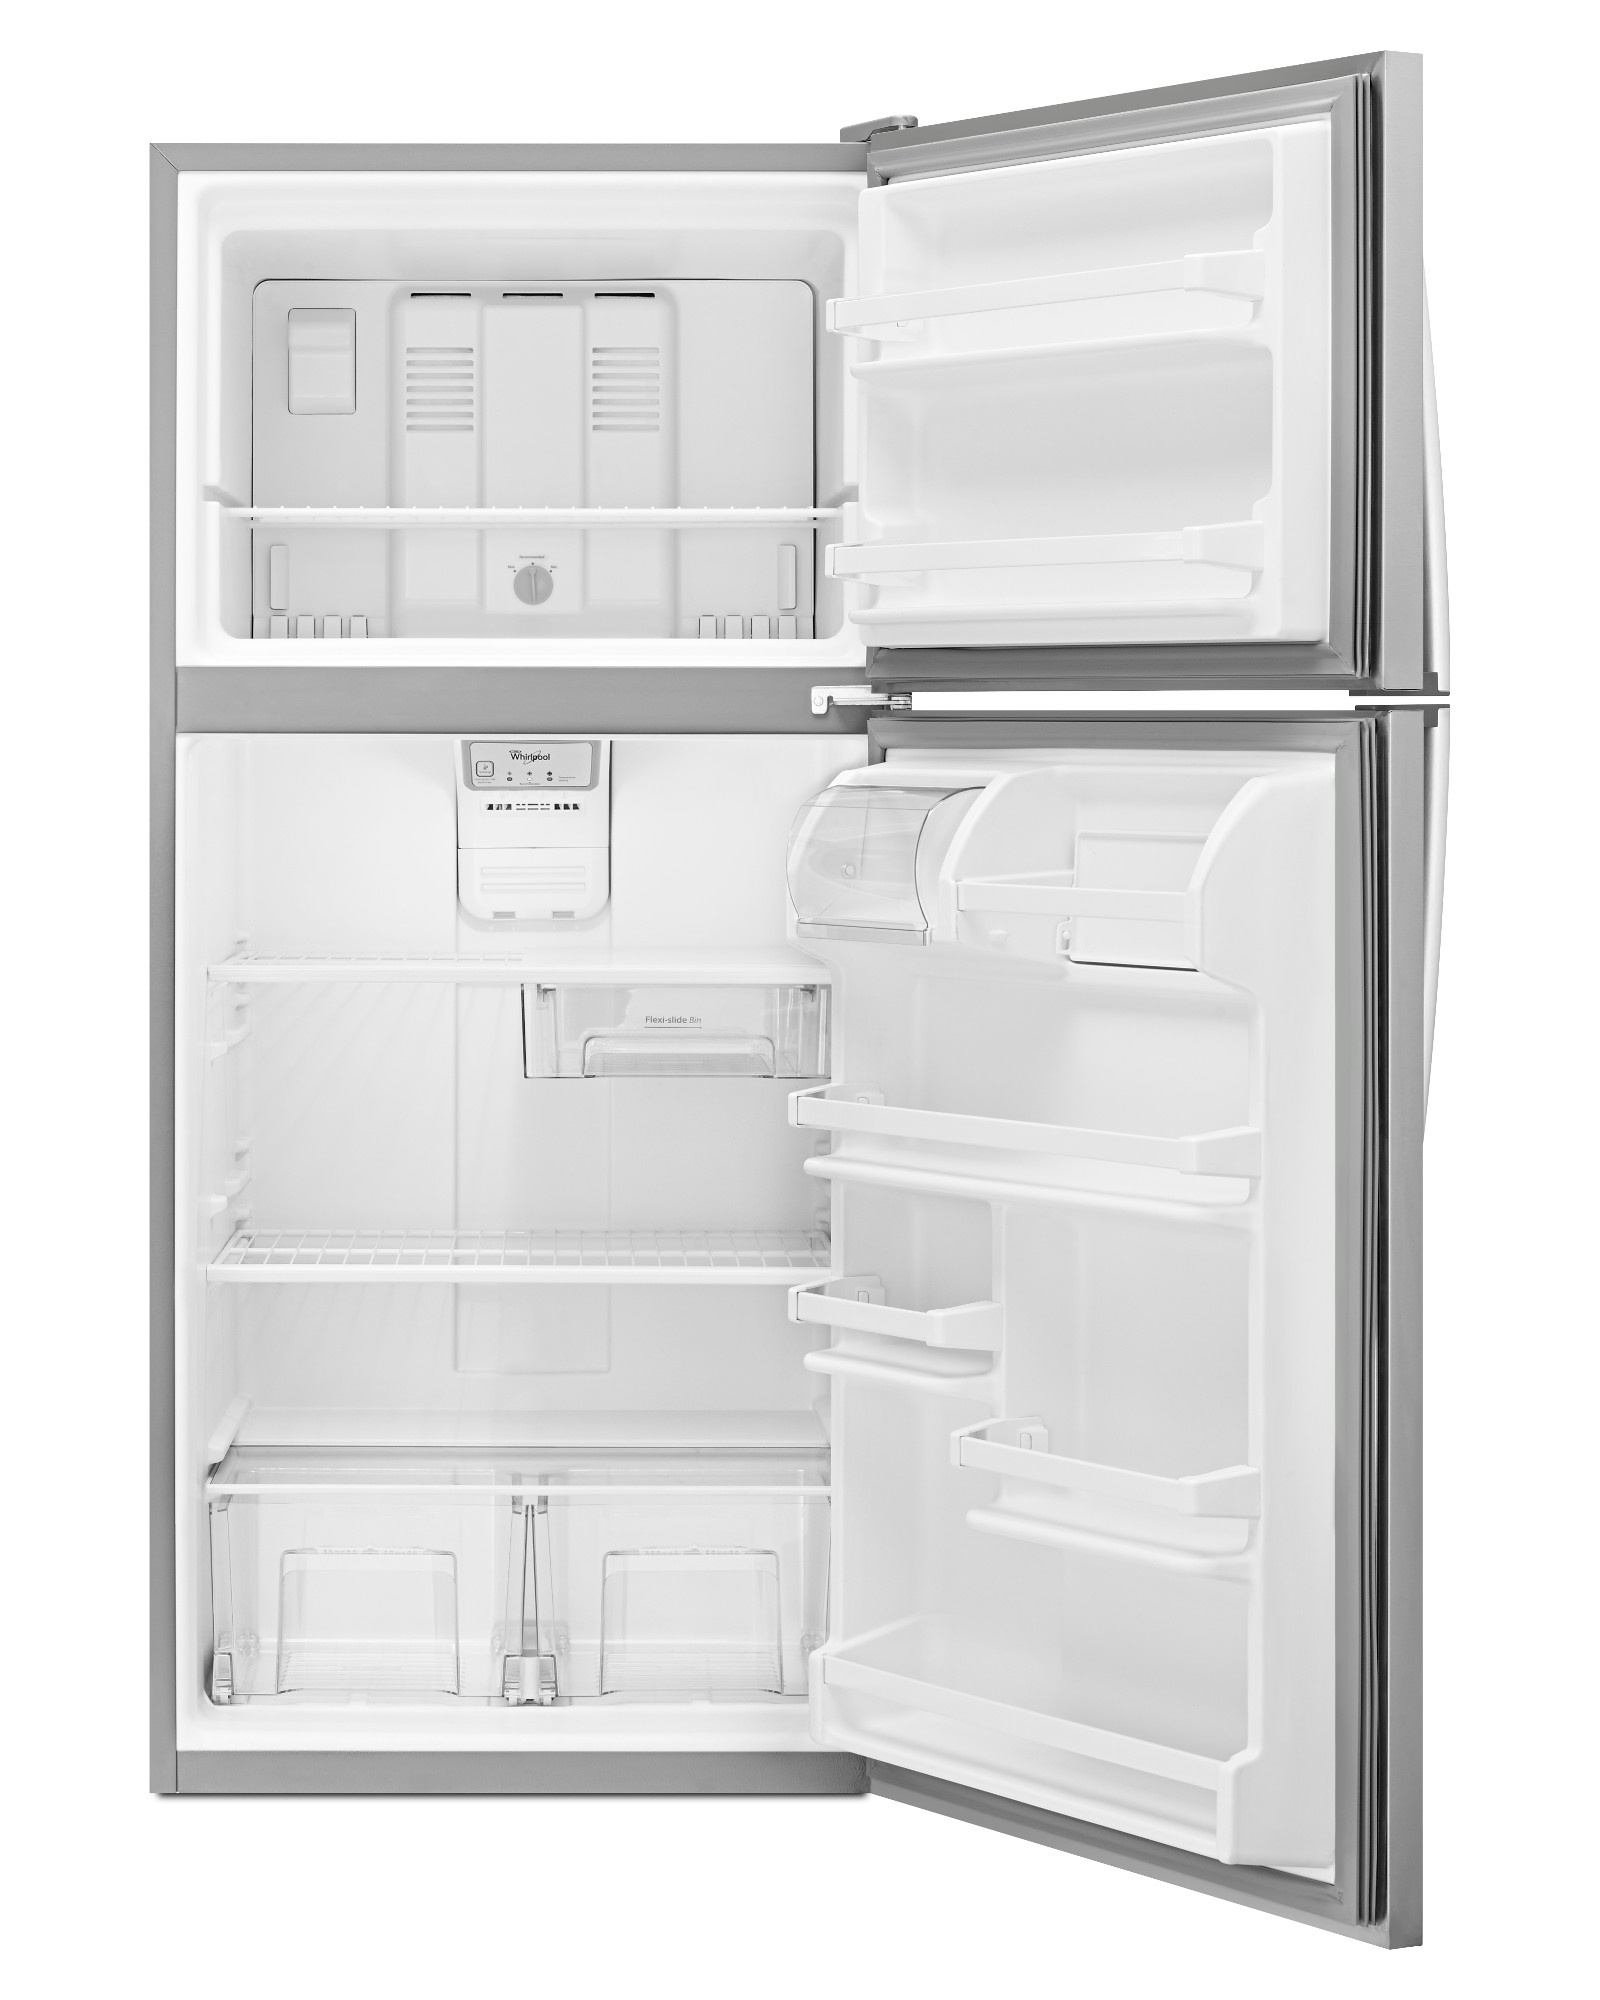 Whirlpool WRT138FZDM 18 cu. ft. Top Freezer Refrigerator - Stainless Steel